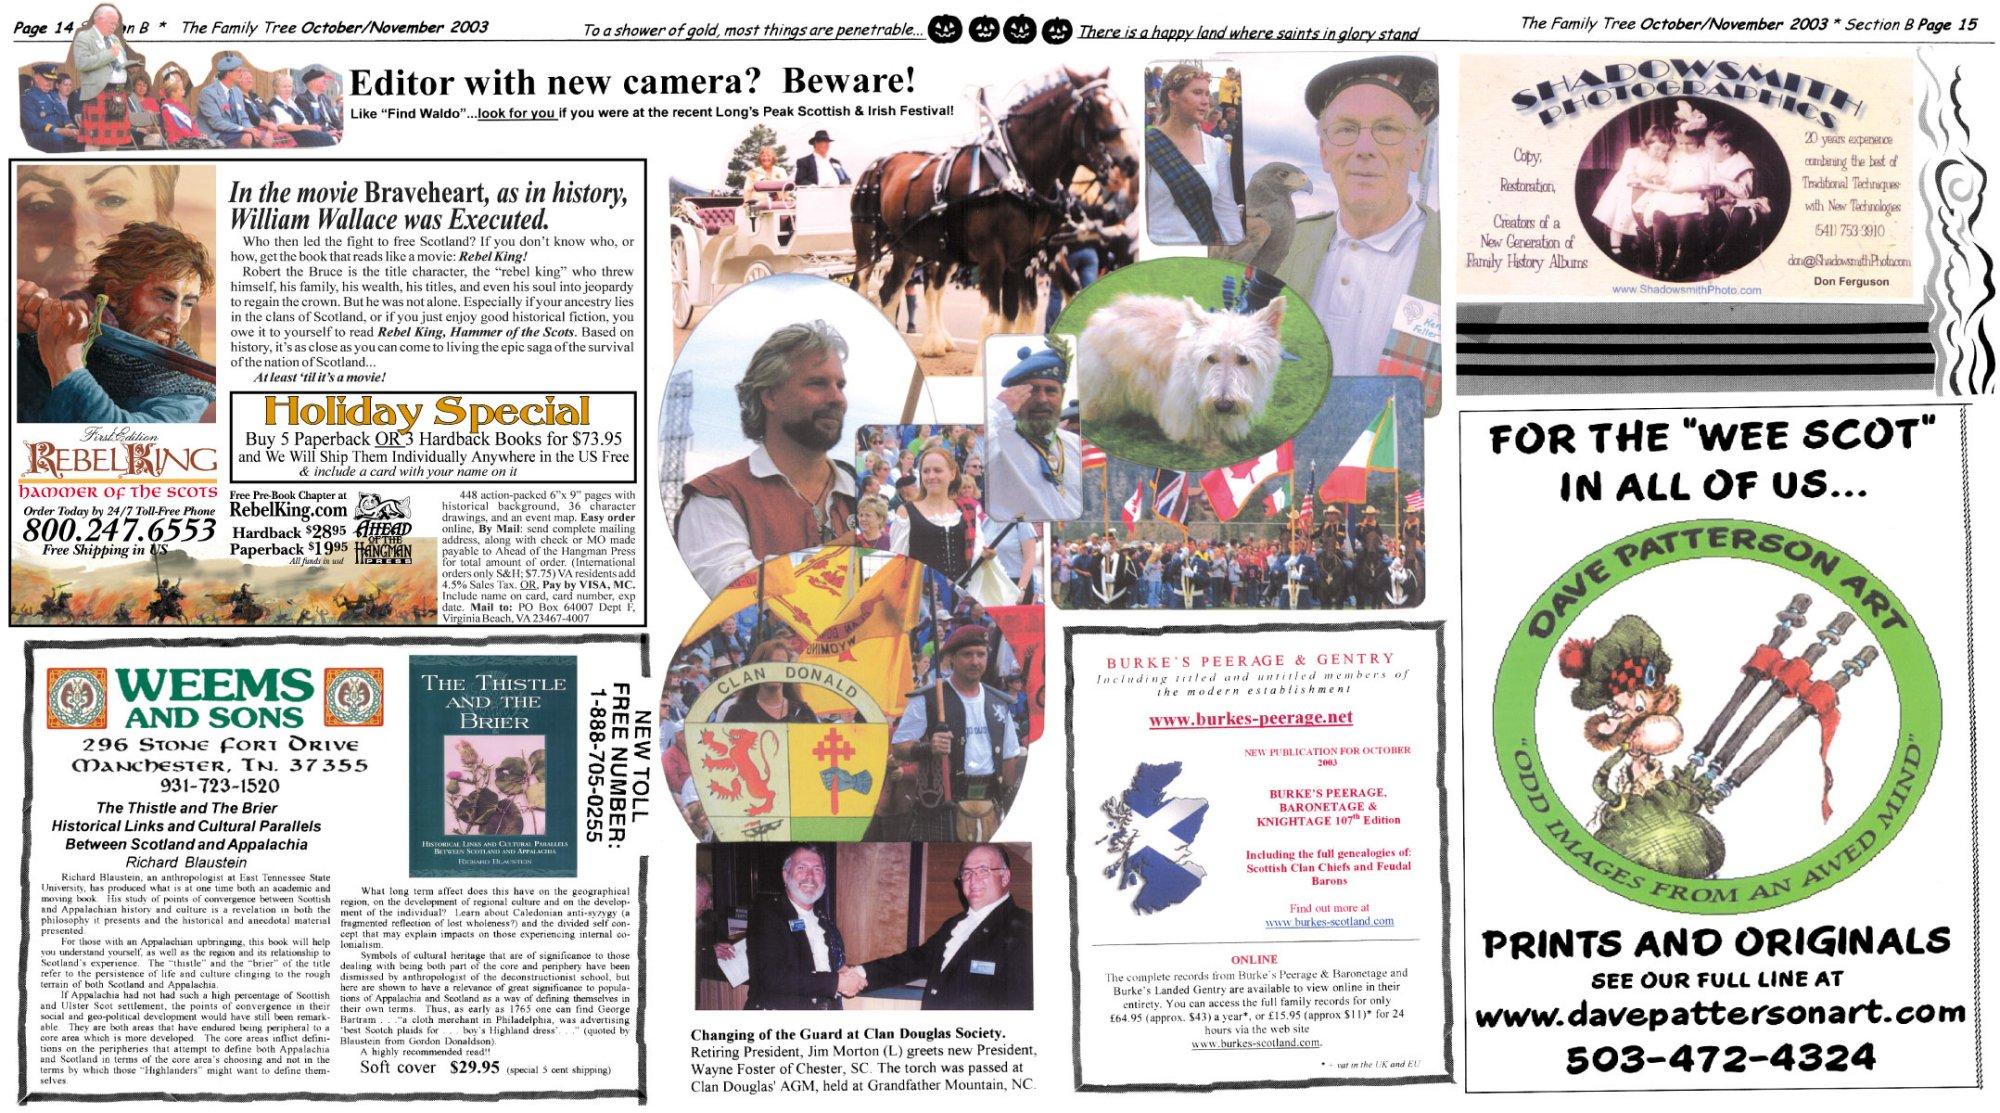 Family Tree Newspaper October/November 2003 Issue